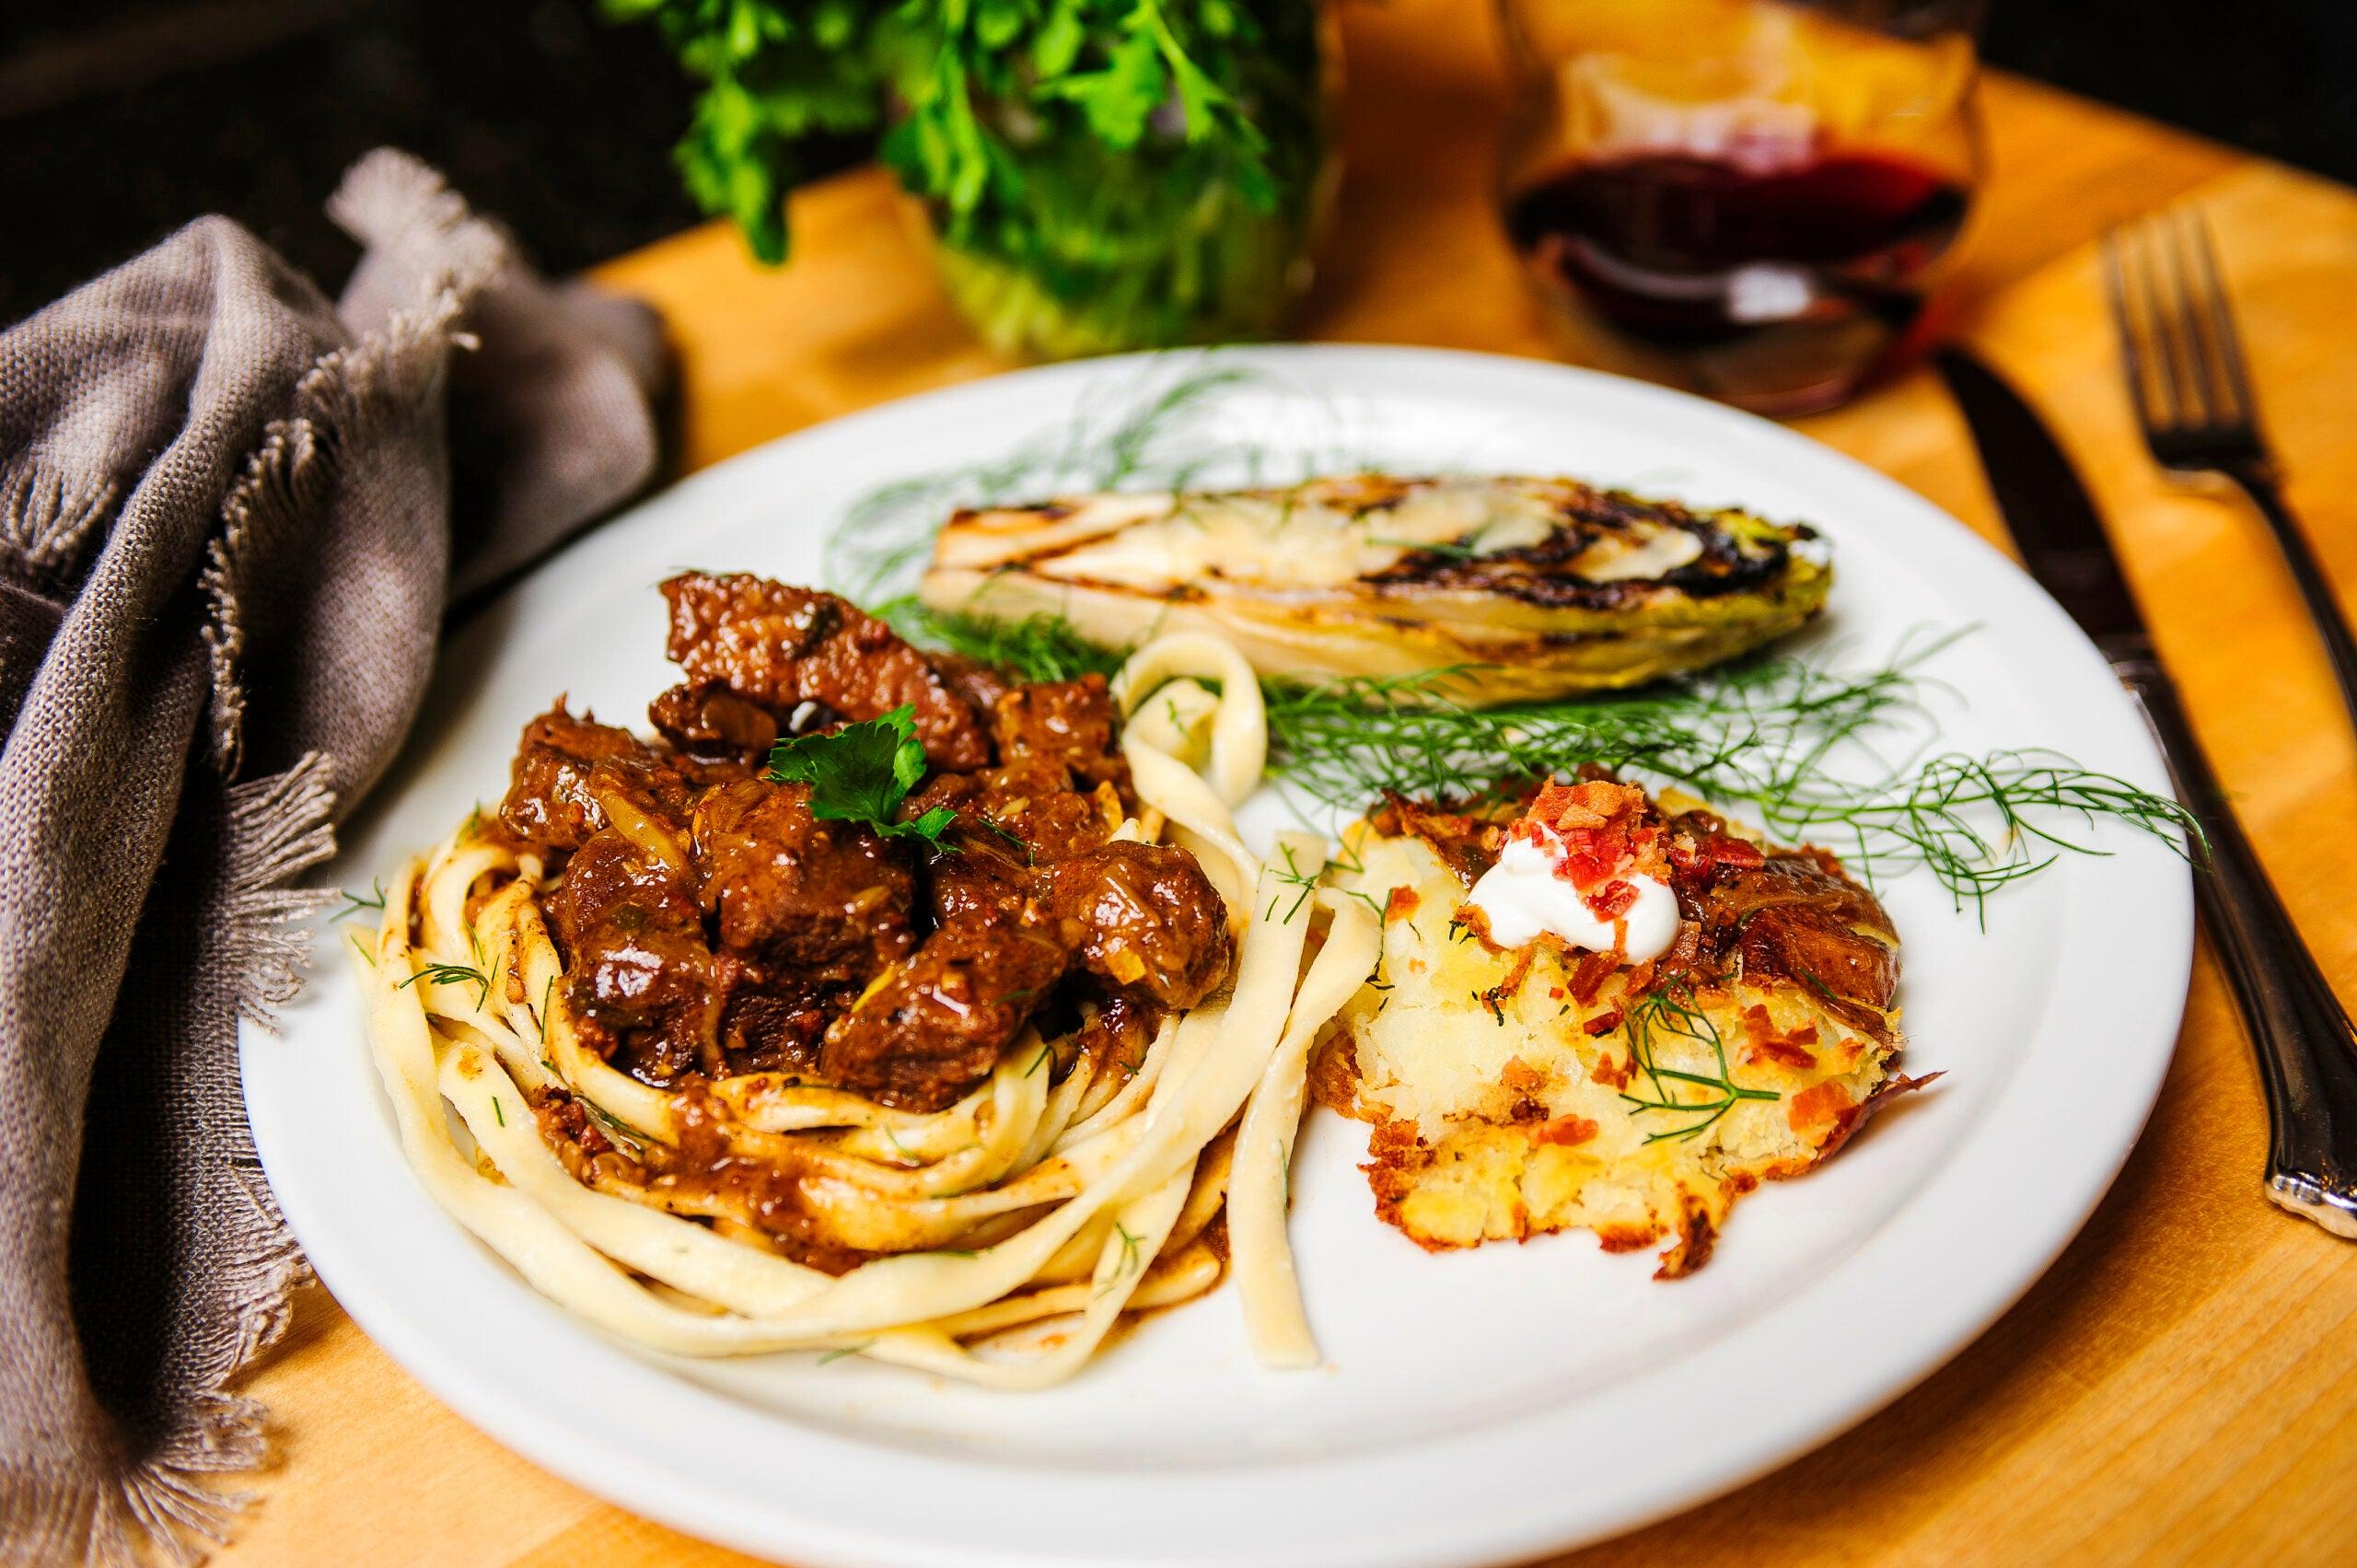 A Recipe for Belgian Carbonnade Using Freezer-Burned Elk Round Steak